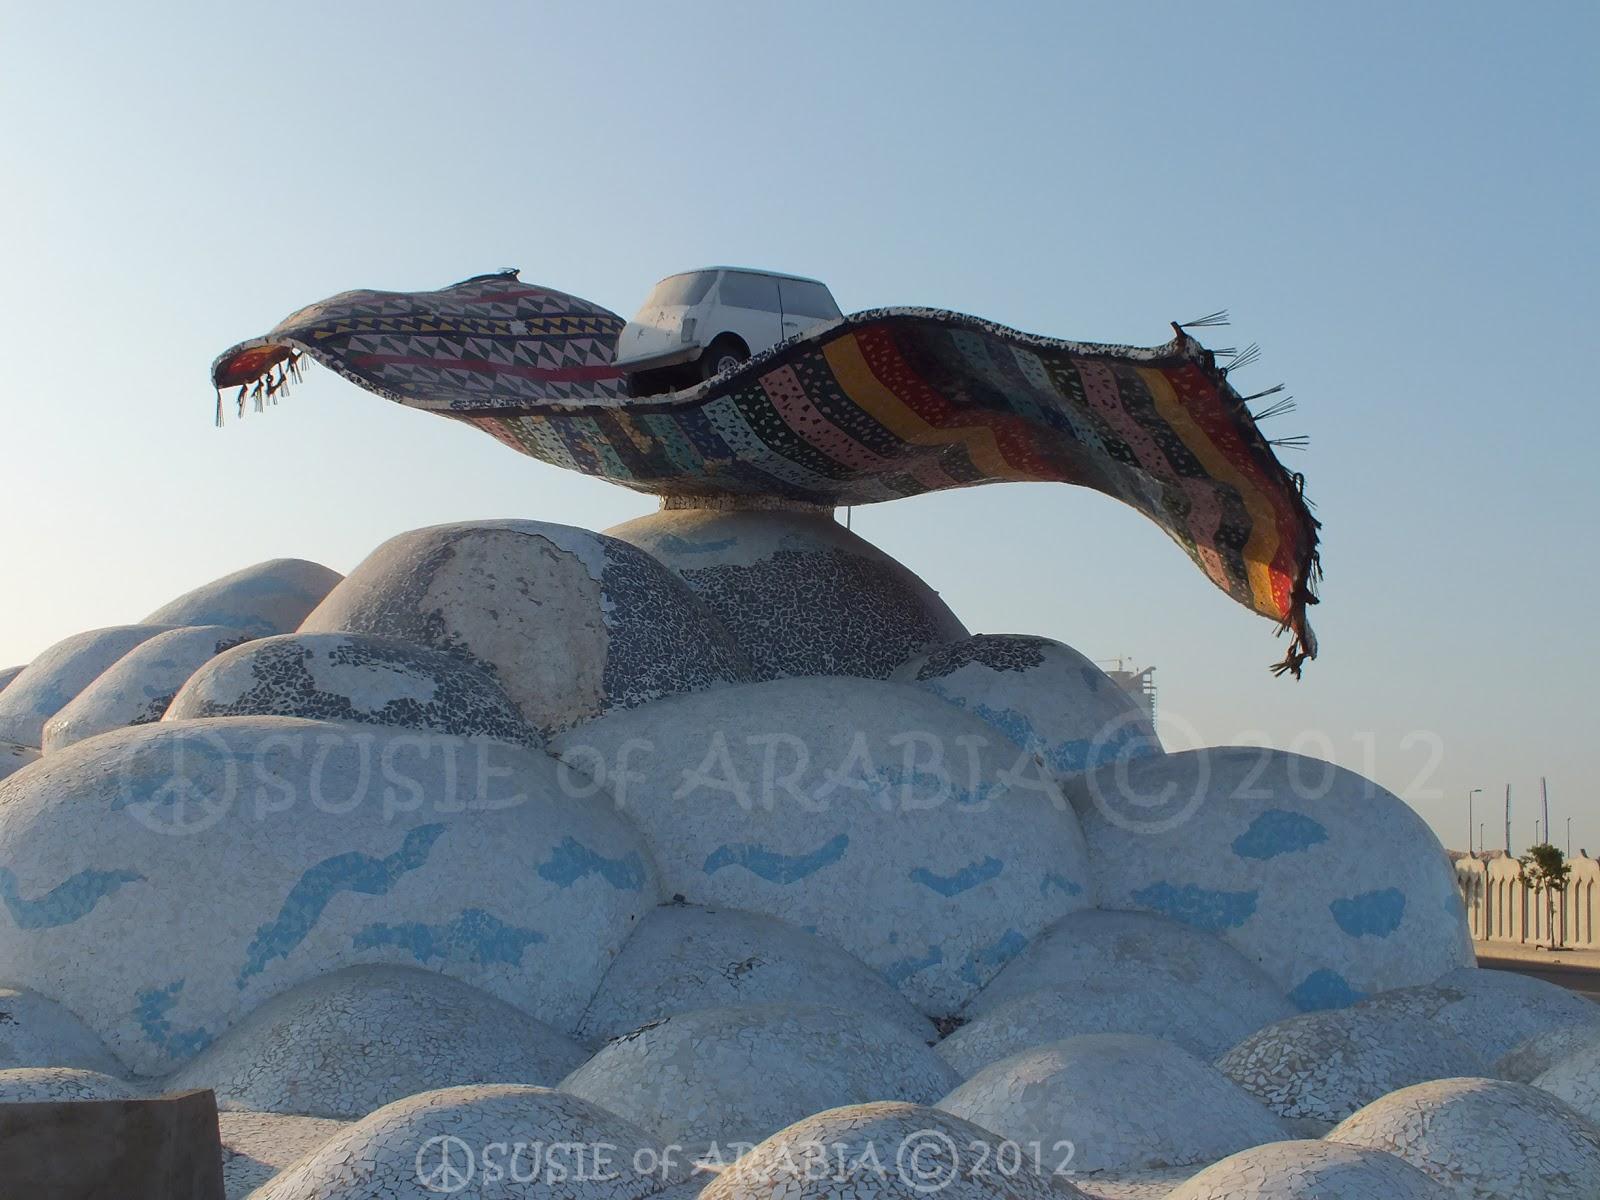 Jeddah Daily Photo: Our World: Magic Carpet Sculpture